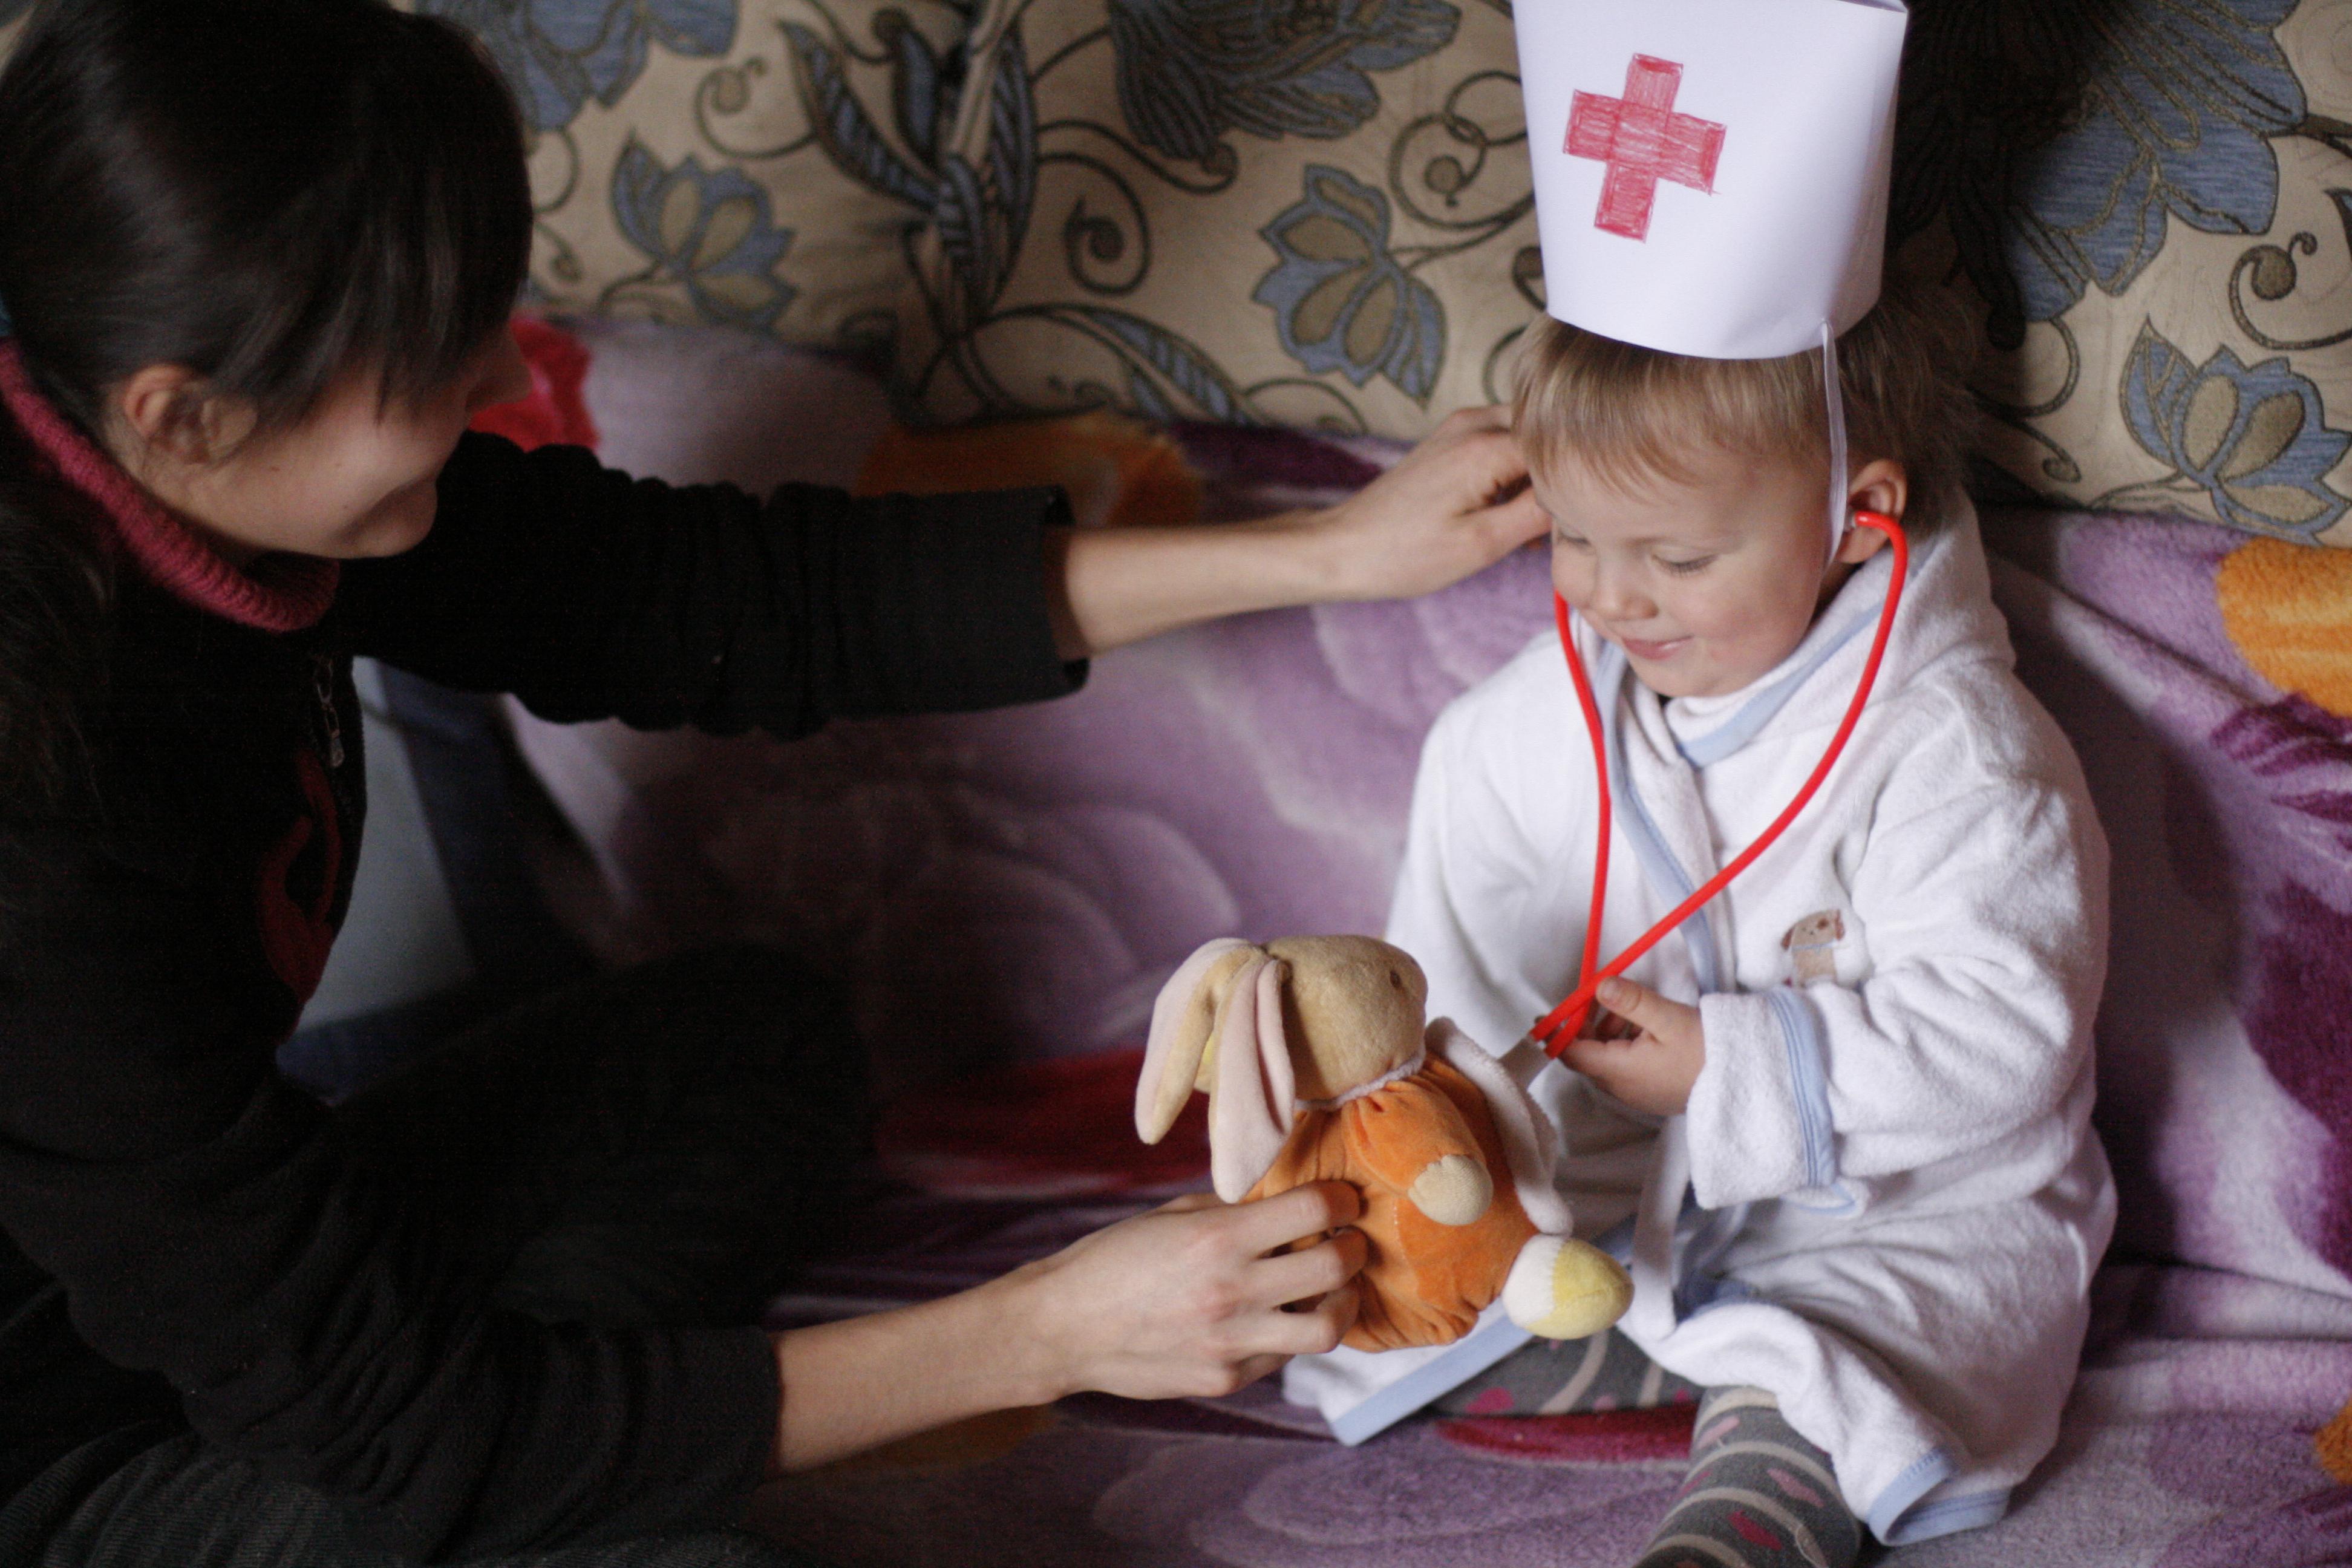 ребёнок играет в доктора, ребёнок в костюме врача